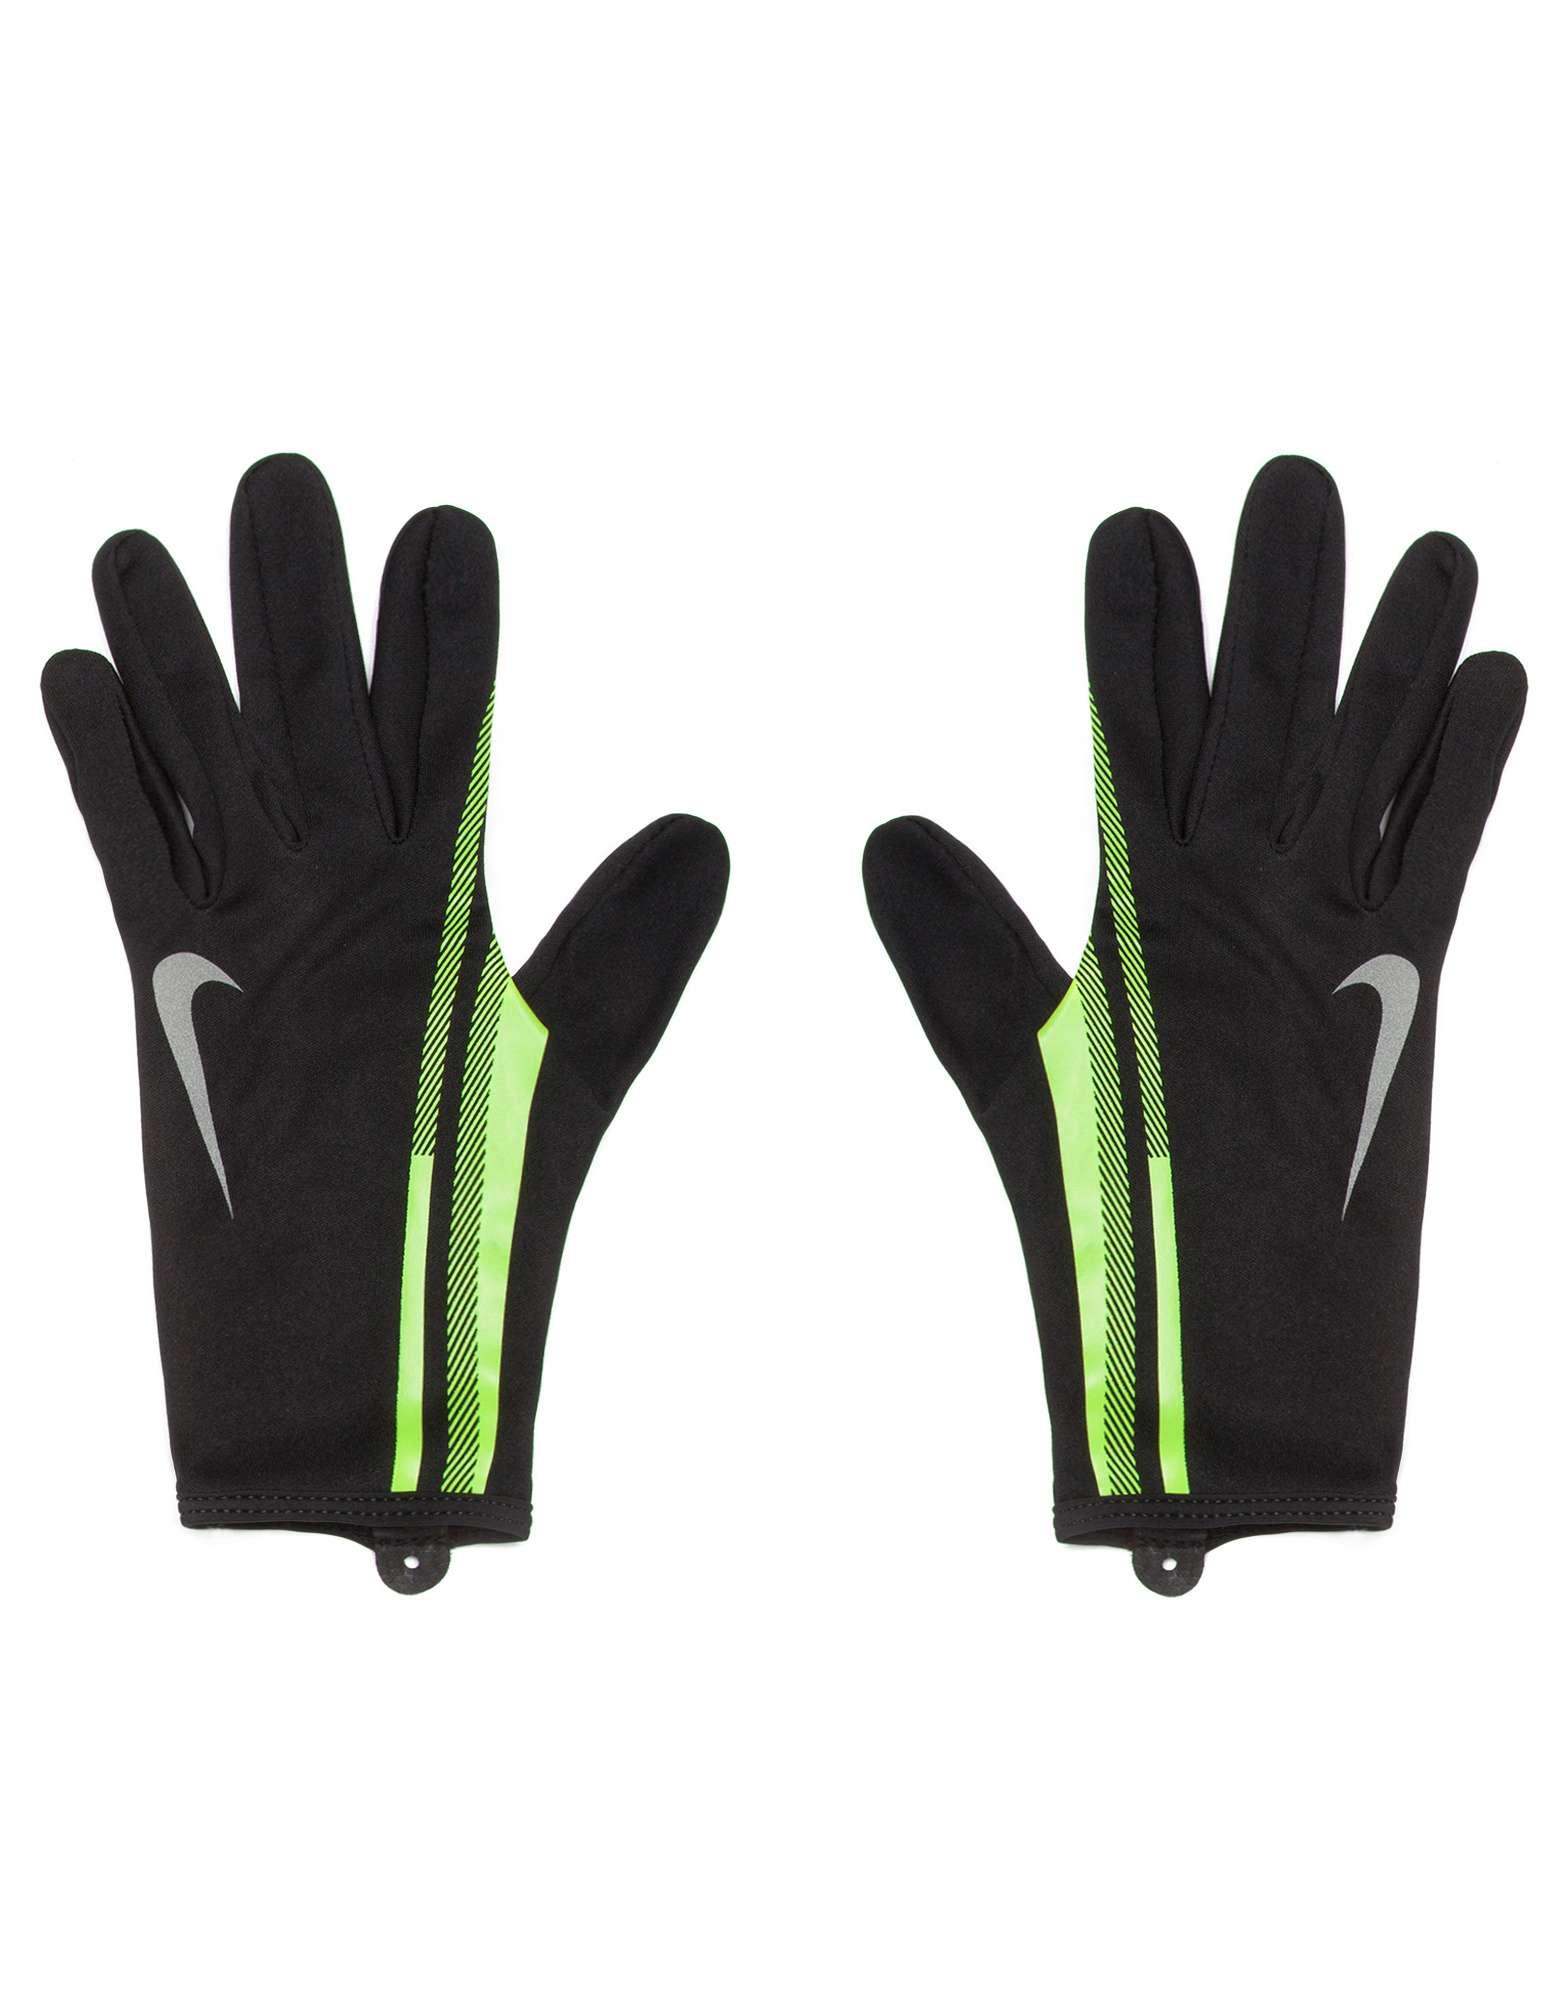 Nike Swift Attitude Running Gloves